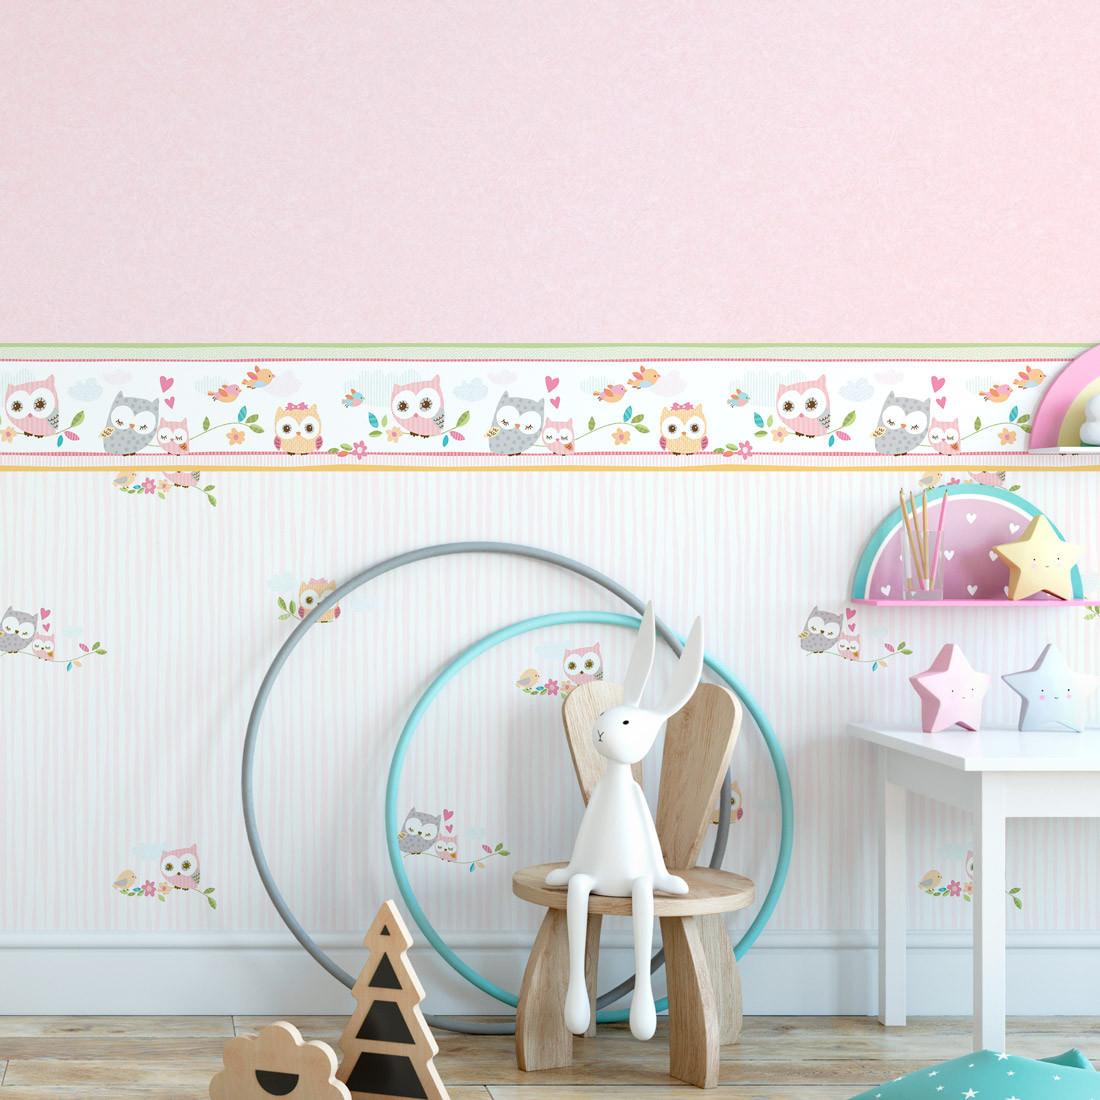 Faixa Decorativa Infantil Corujas - Nido